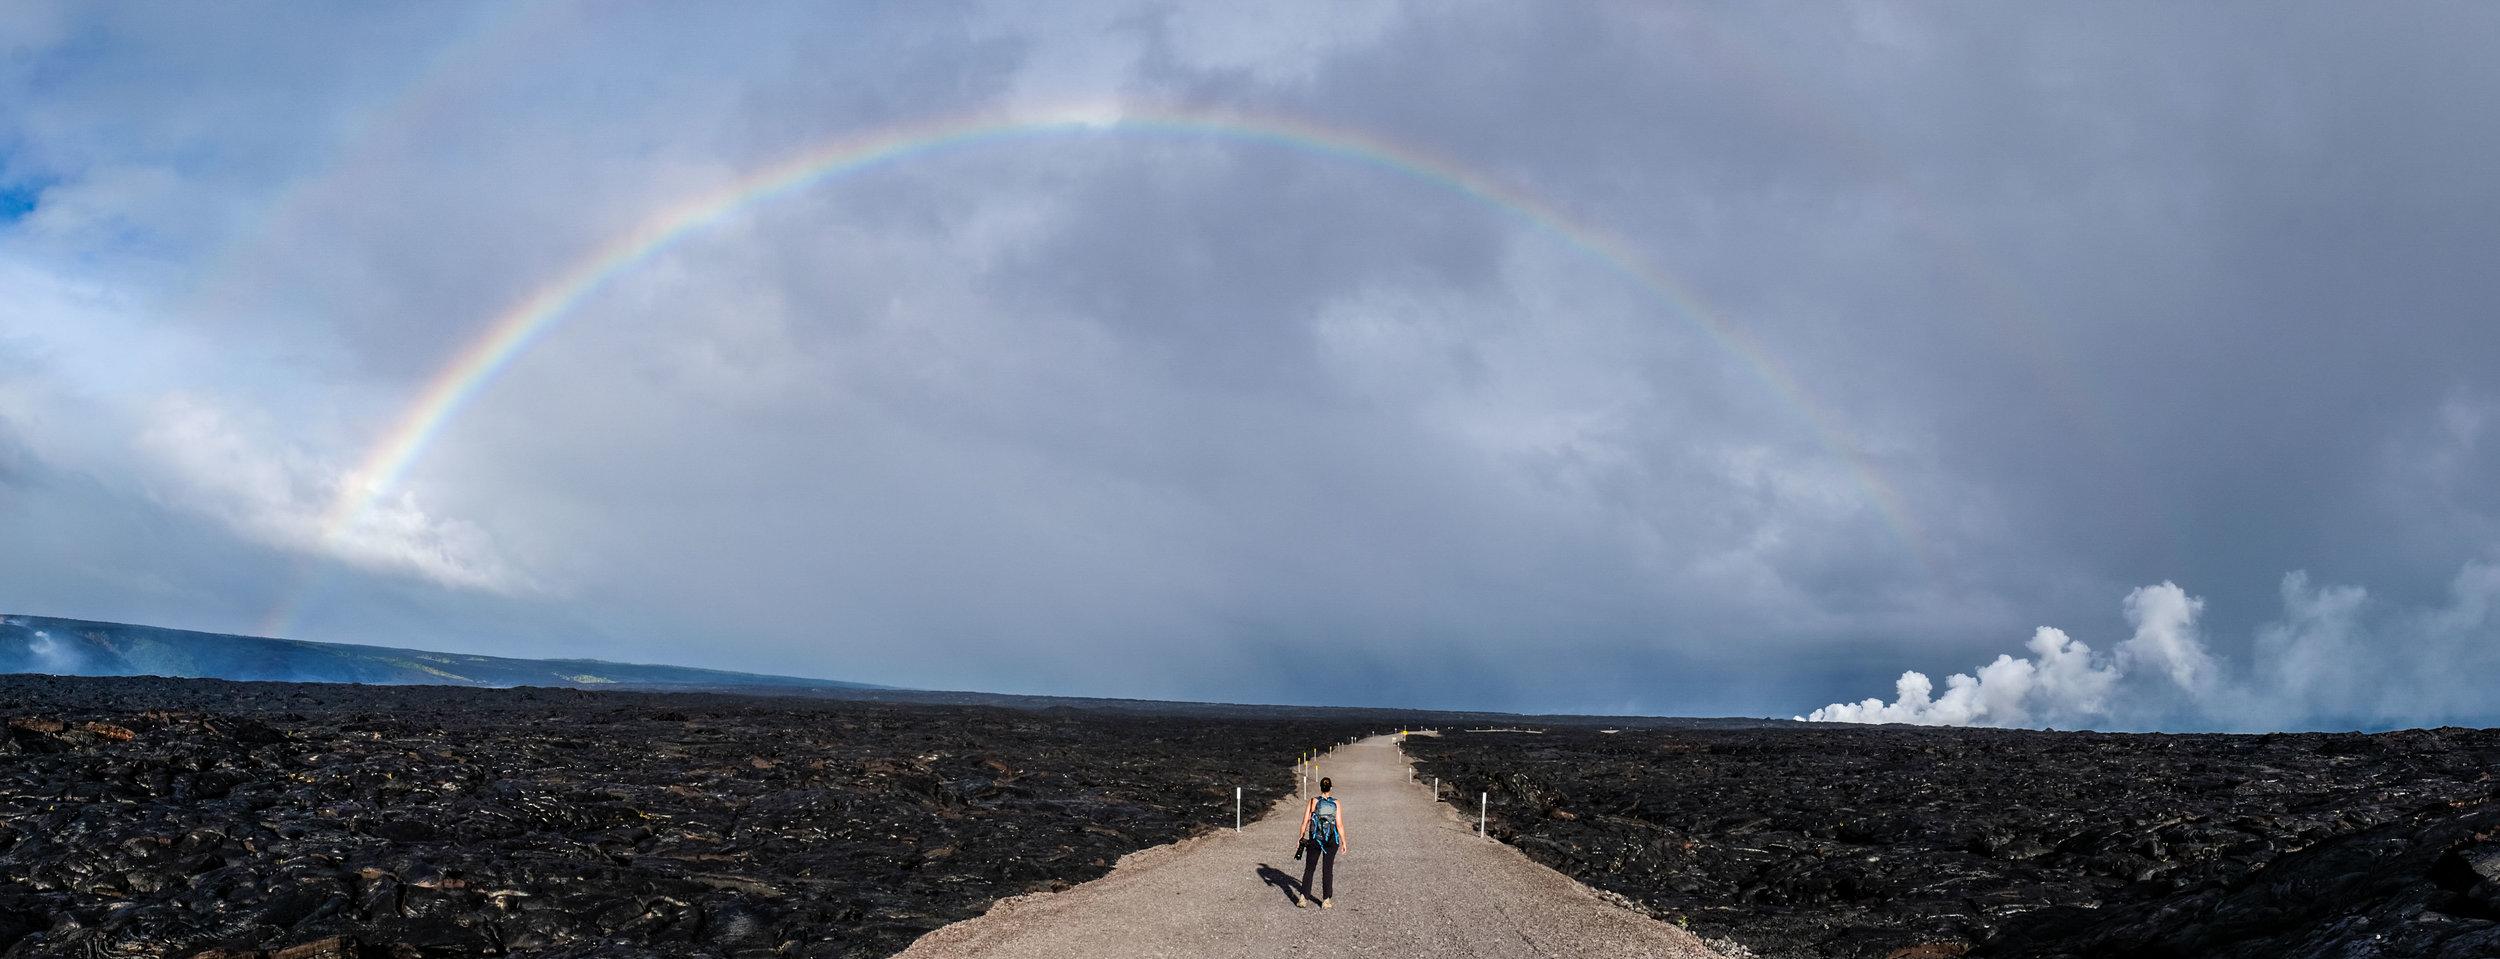 The land of rainbows!